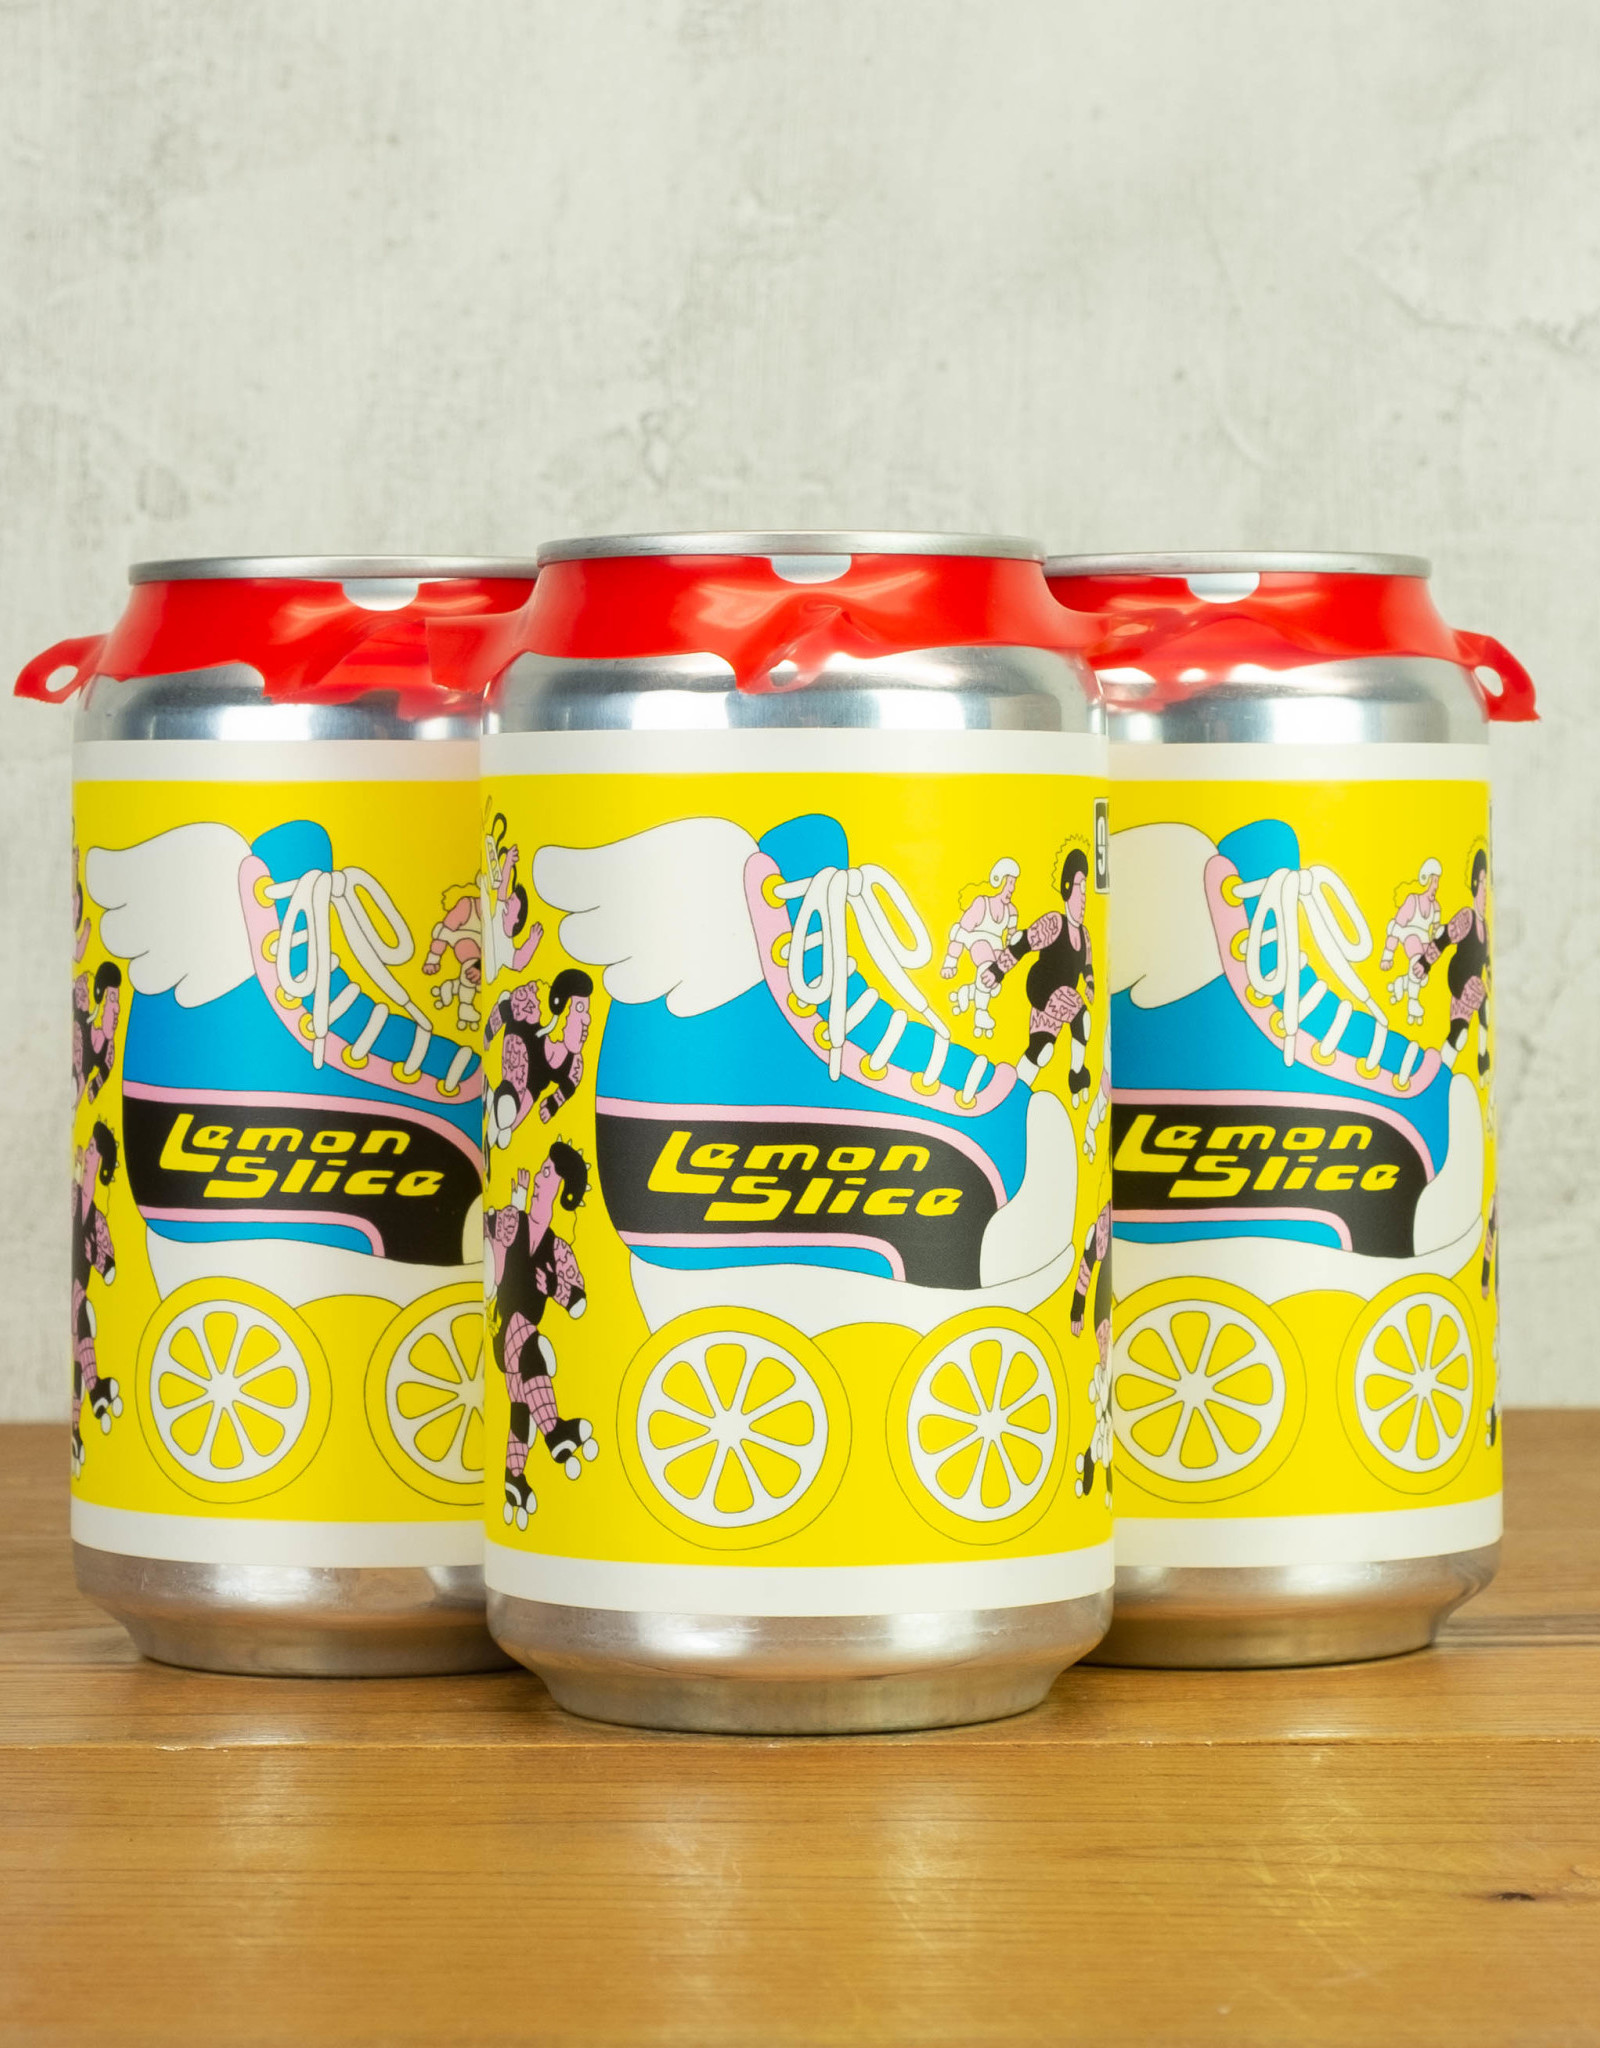 Prairie Lemon Slice Sour 4pk